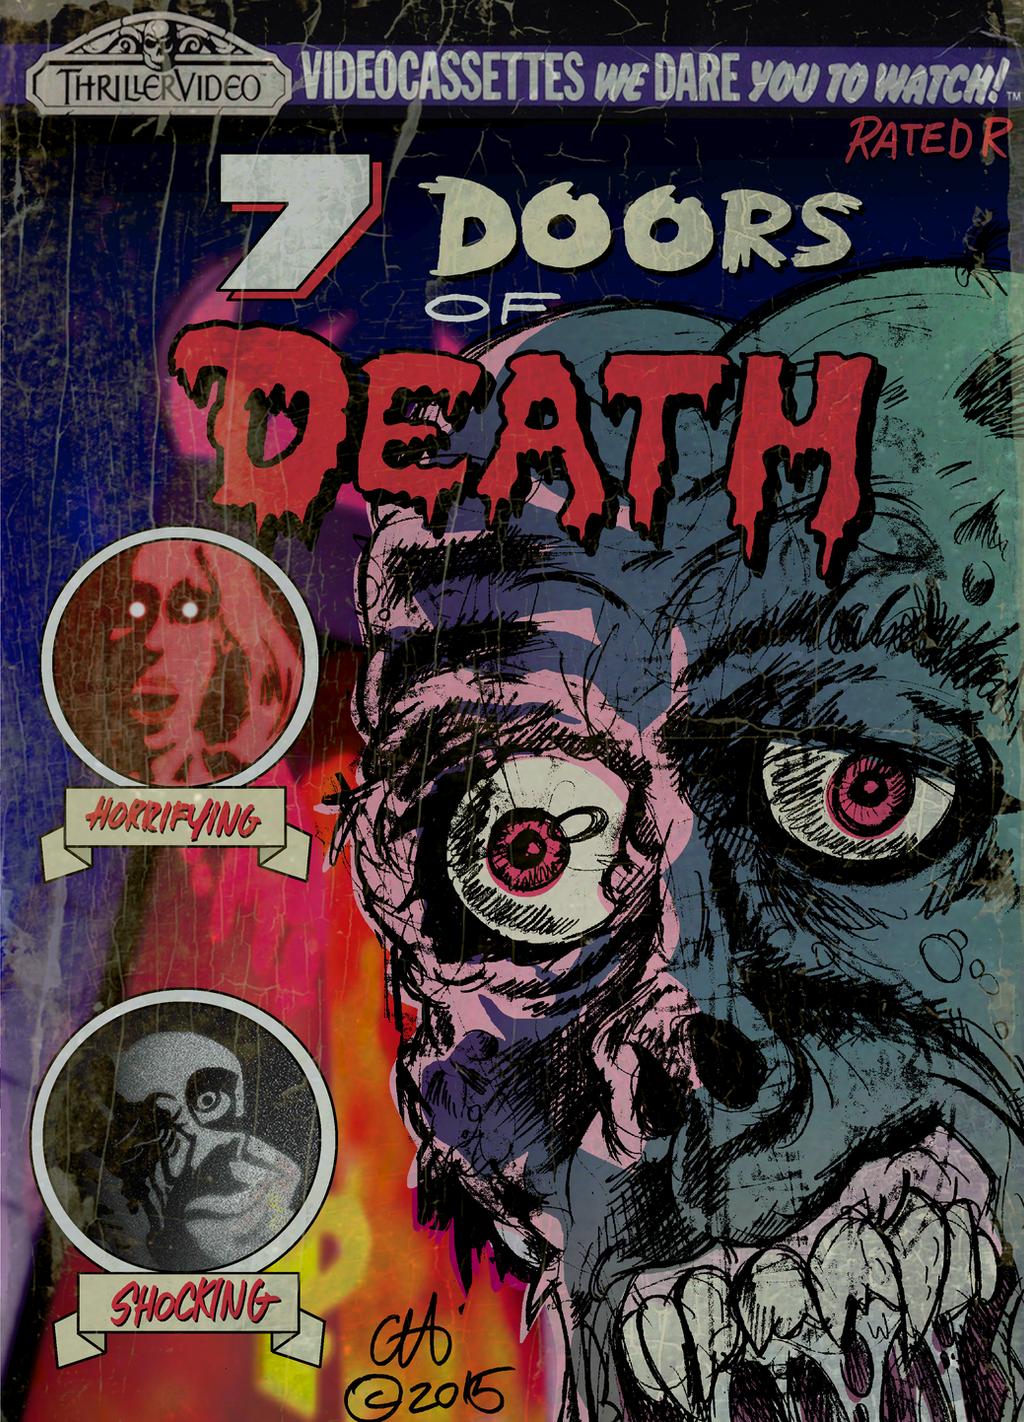 ... 7 Doors Of Death by Chopfe & 7 Doors Of Death by Chopfe on DeviantArt pezcame.com